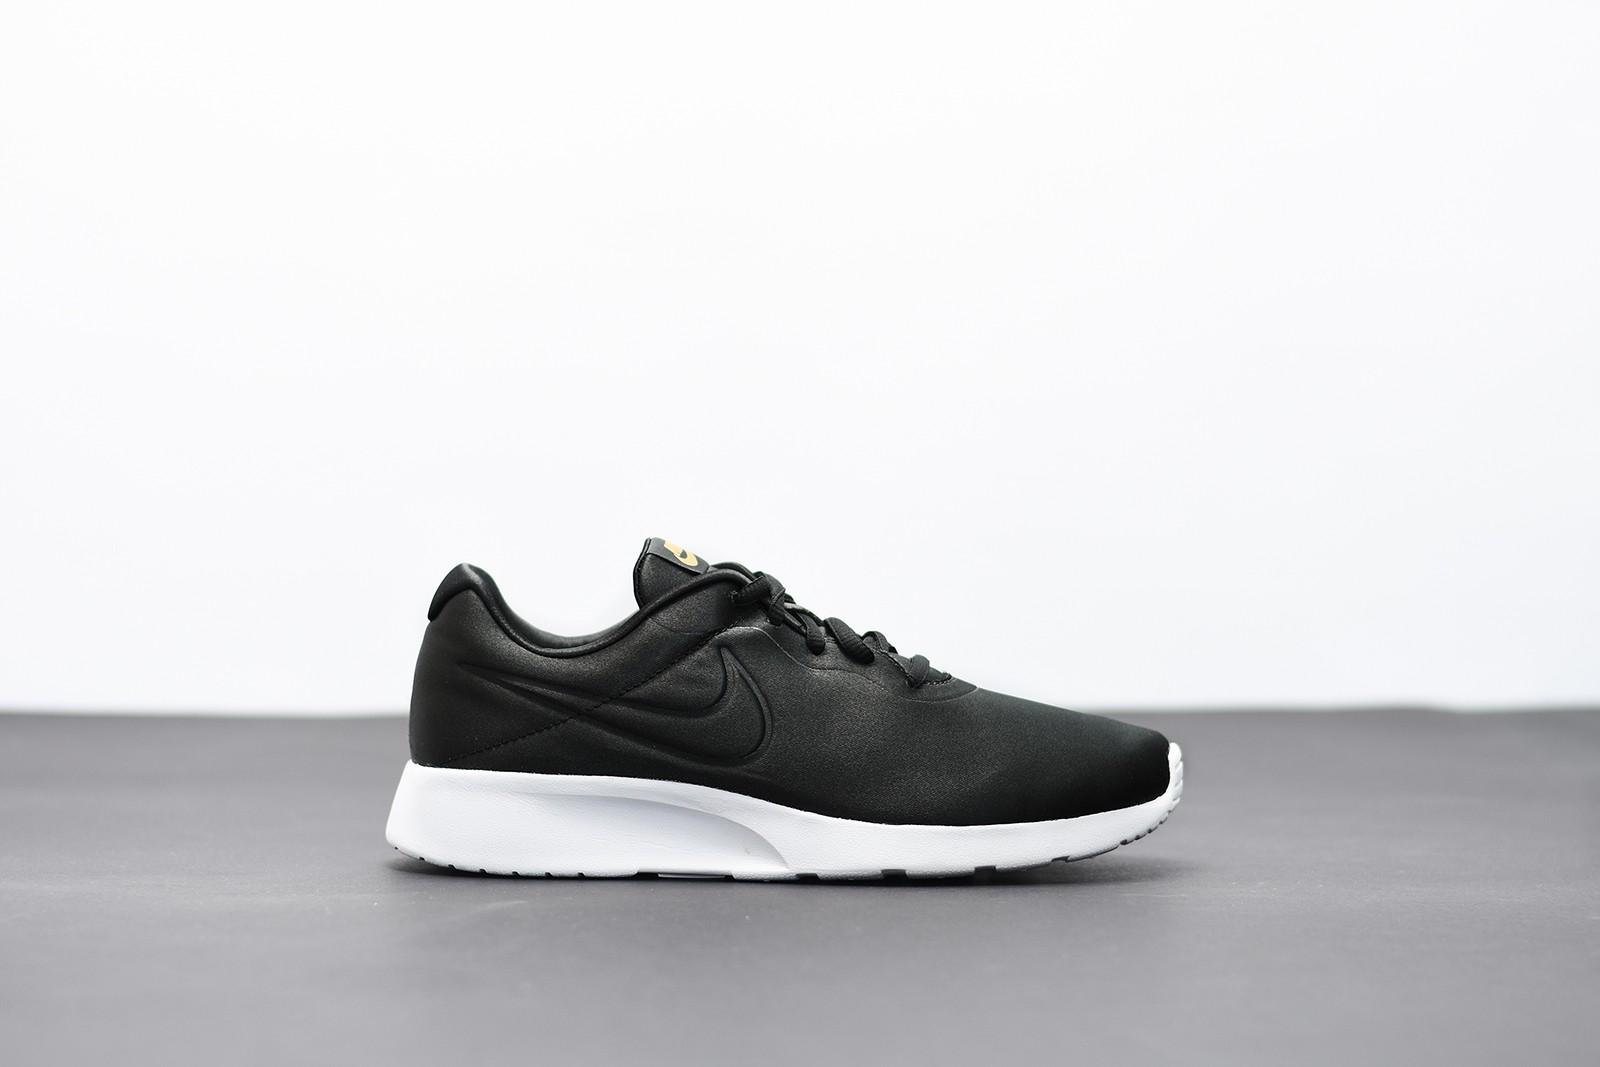 Dámské Tenisky Nike WMNS TANJUN PREM  fee8bdf6fc